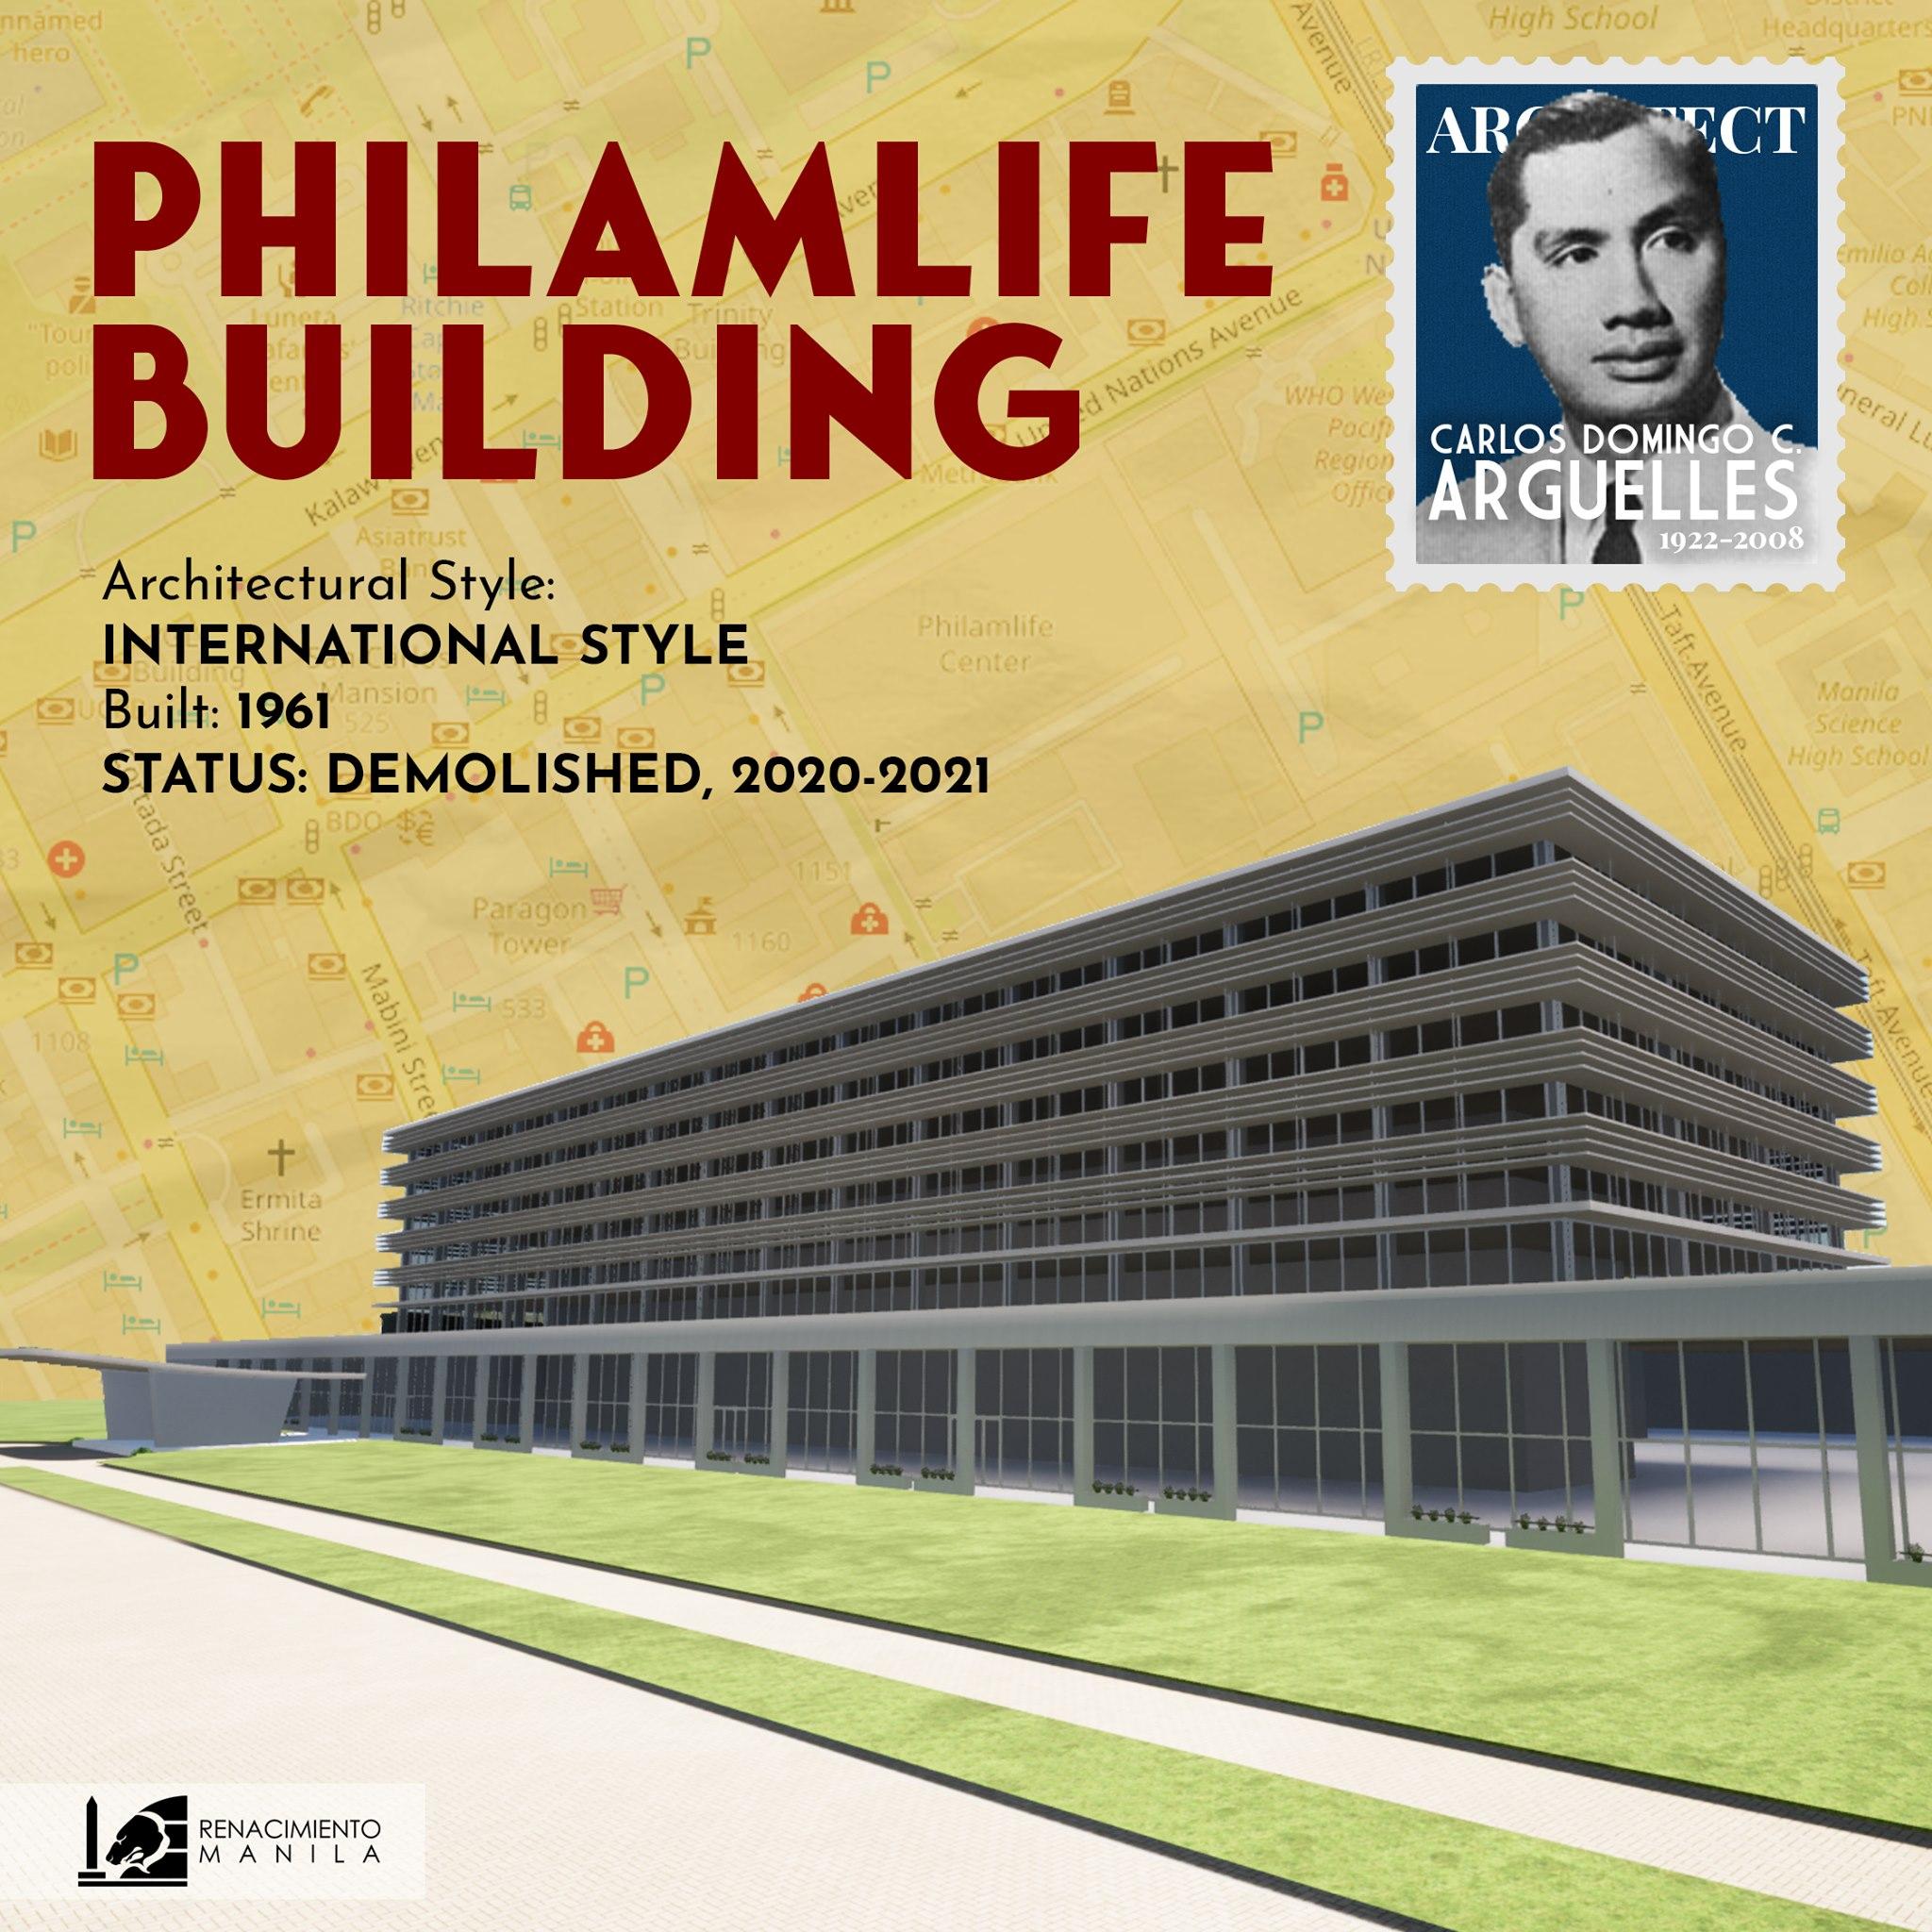 Philamlife Building - Carlos Arguelles (1917-2008)